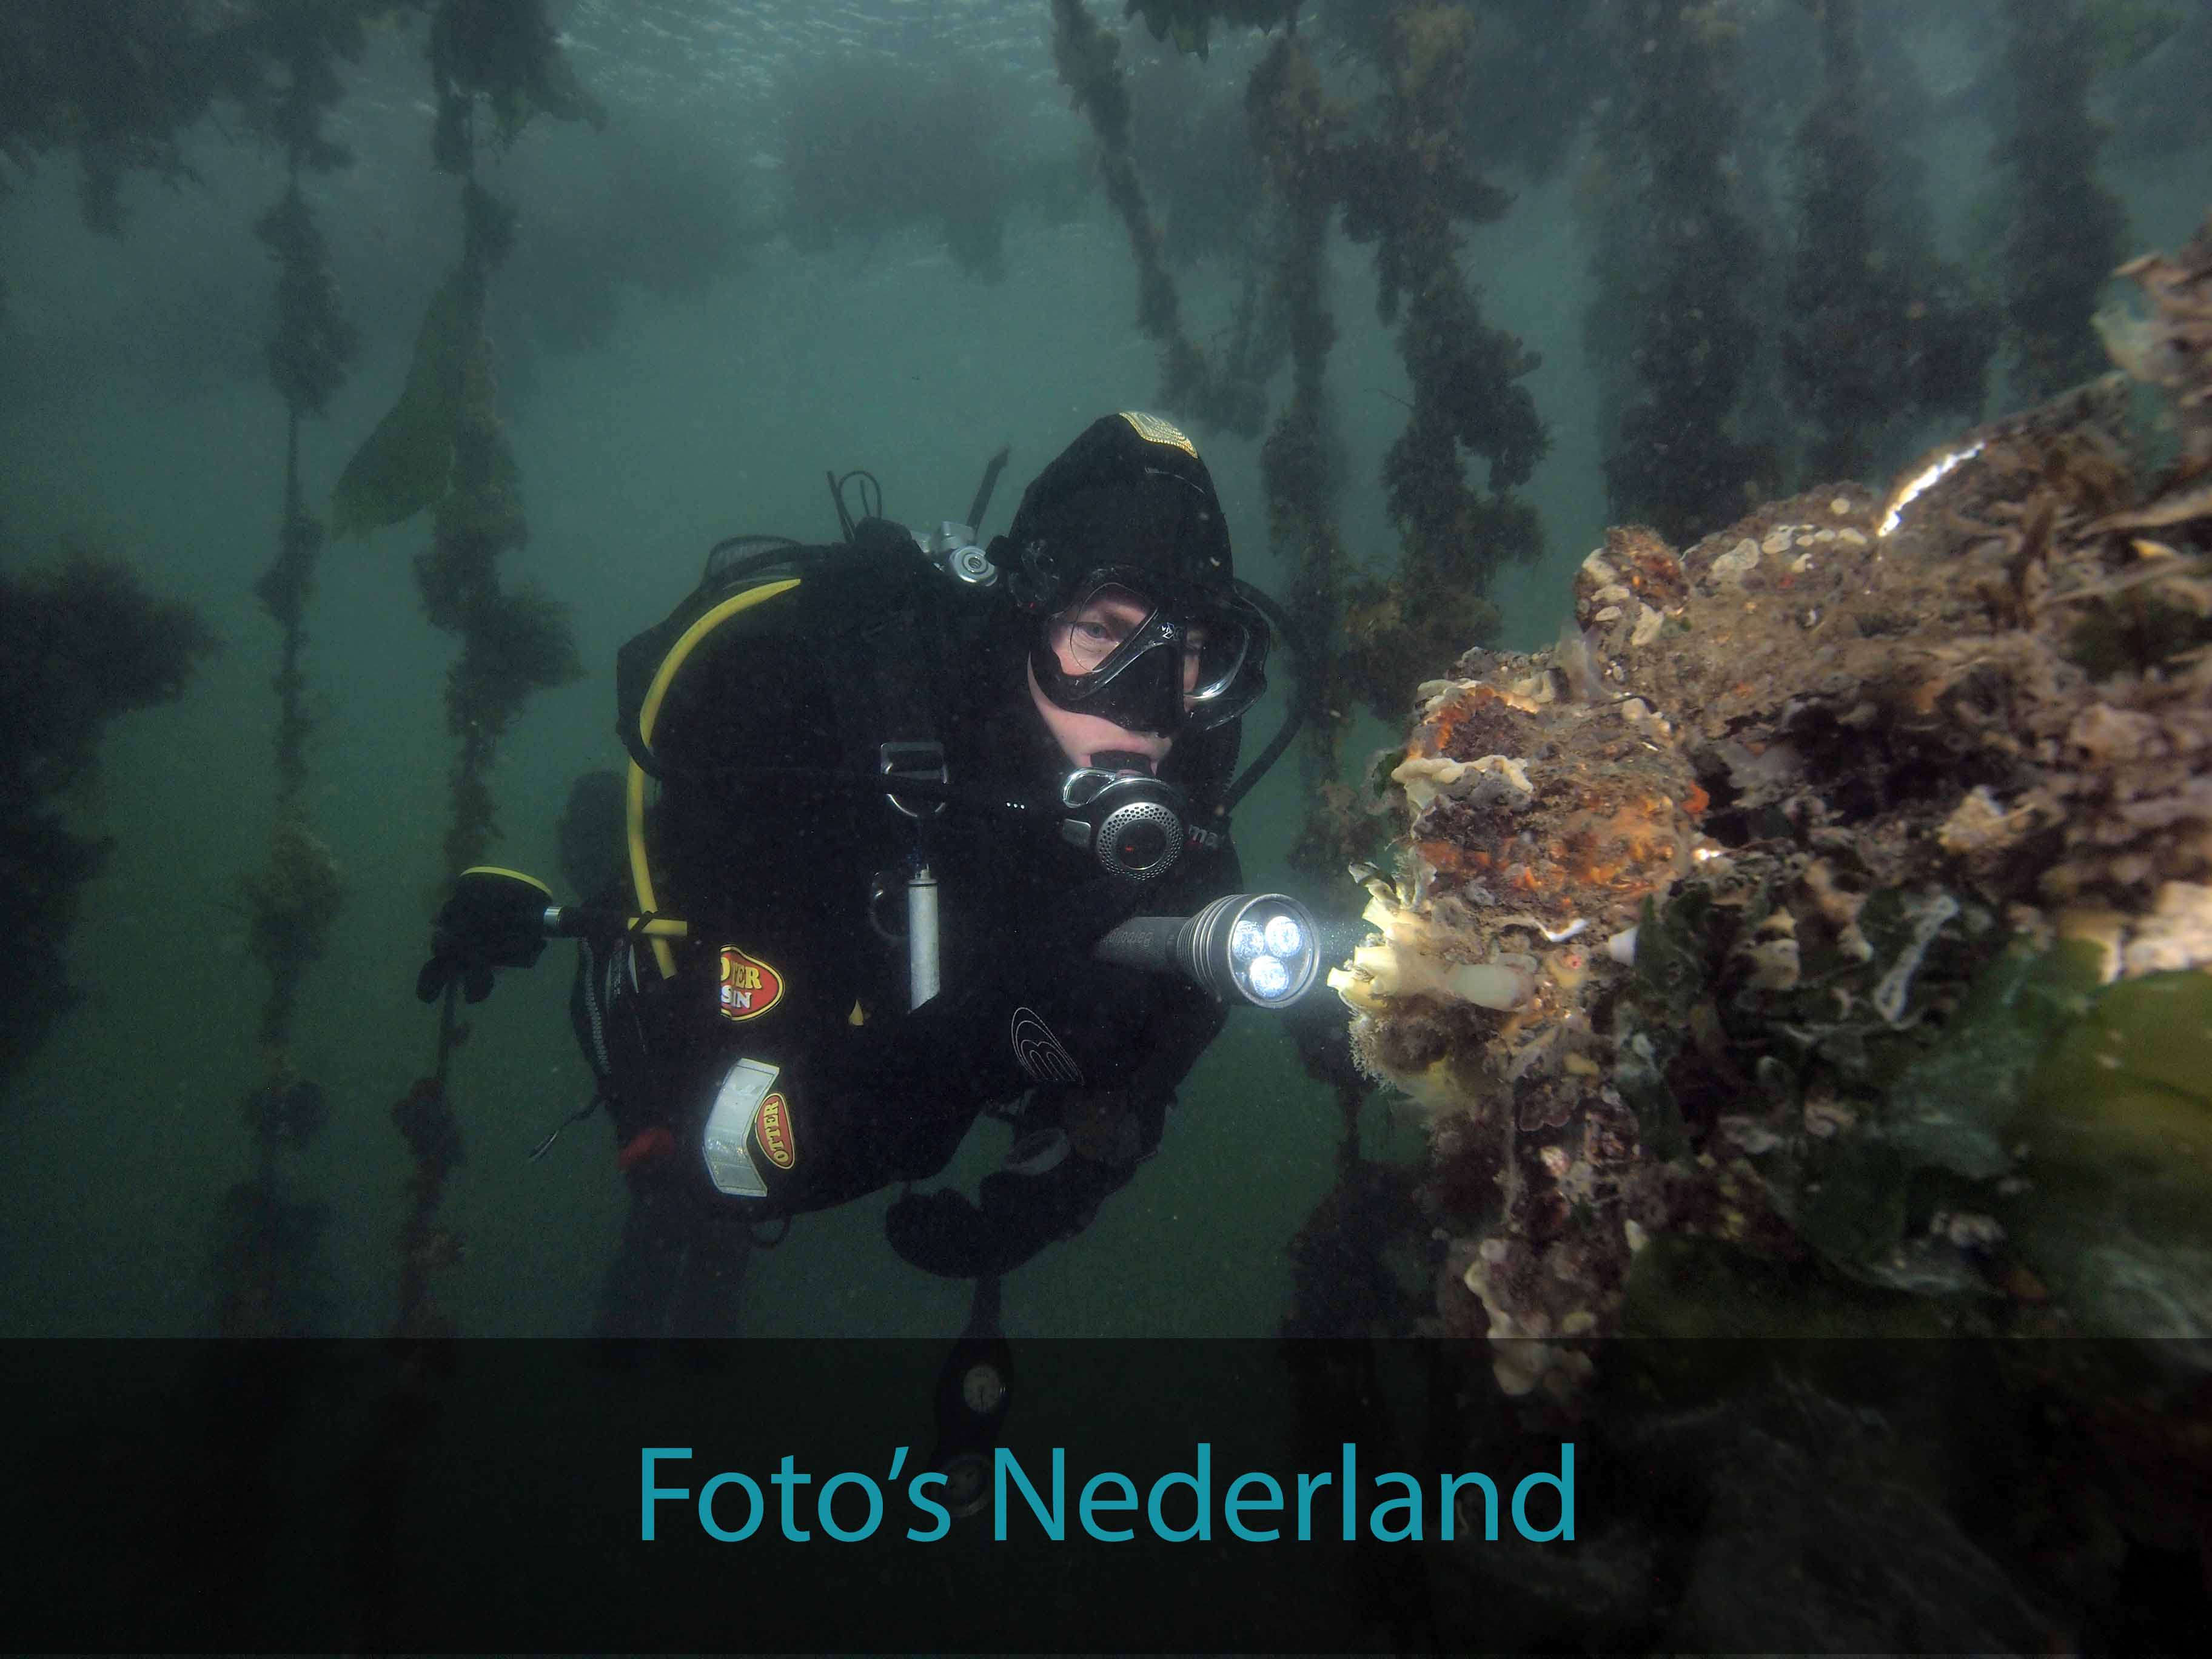 Foto's Nederland